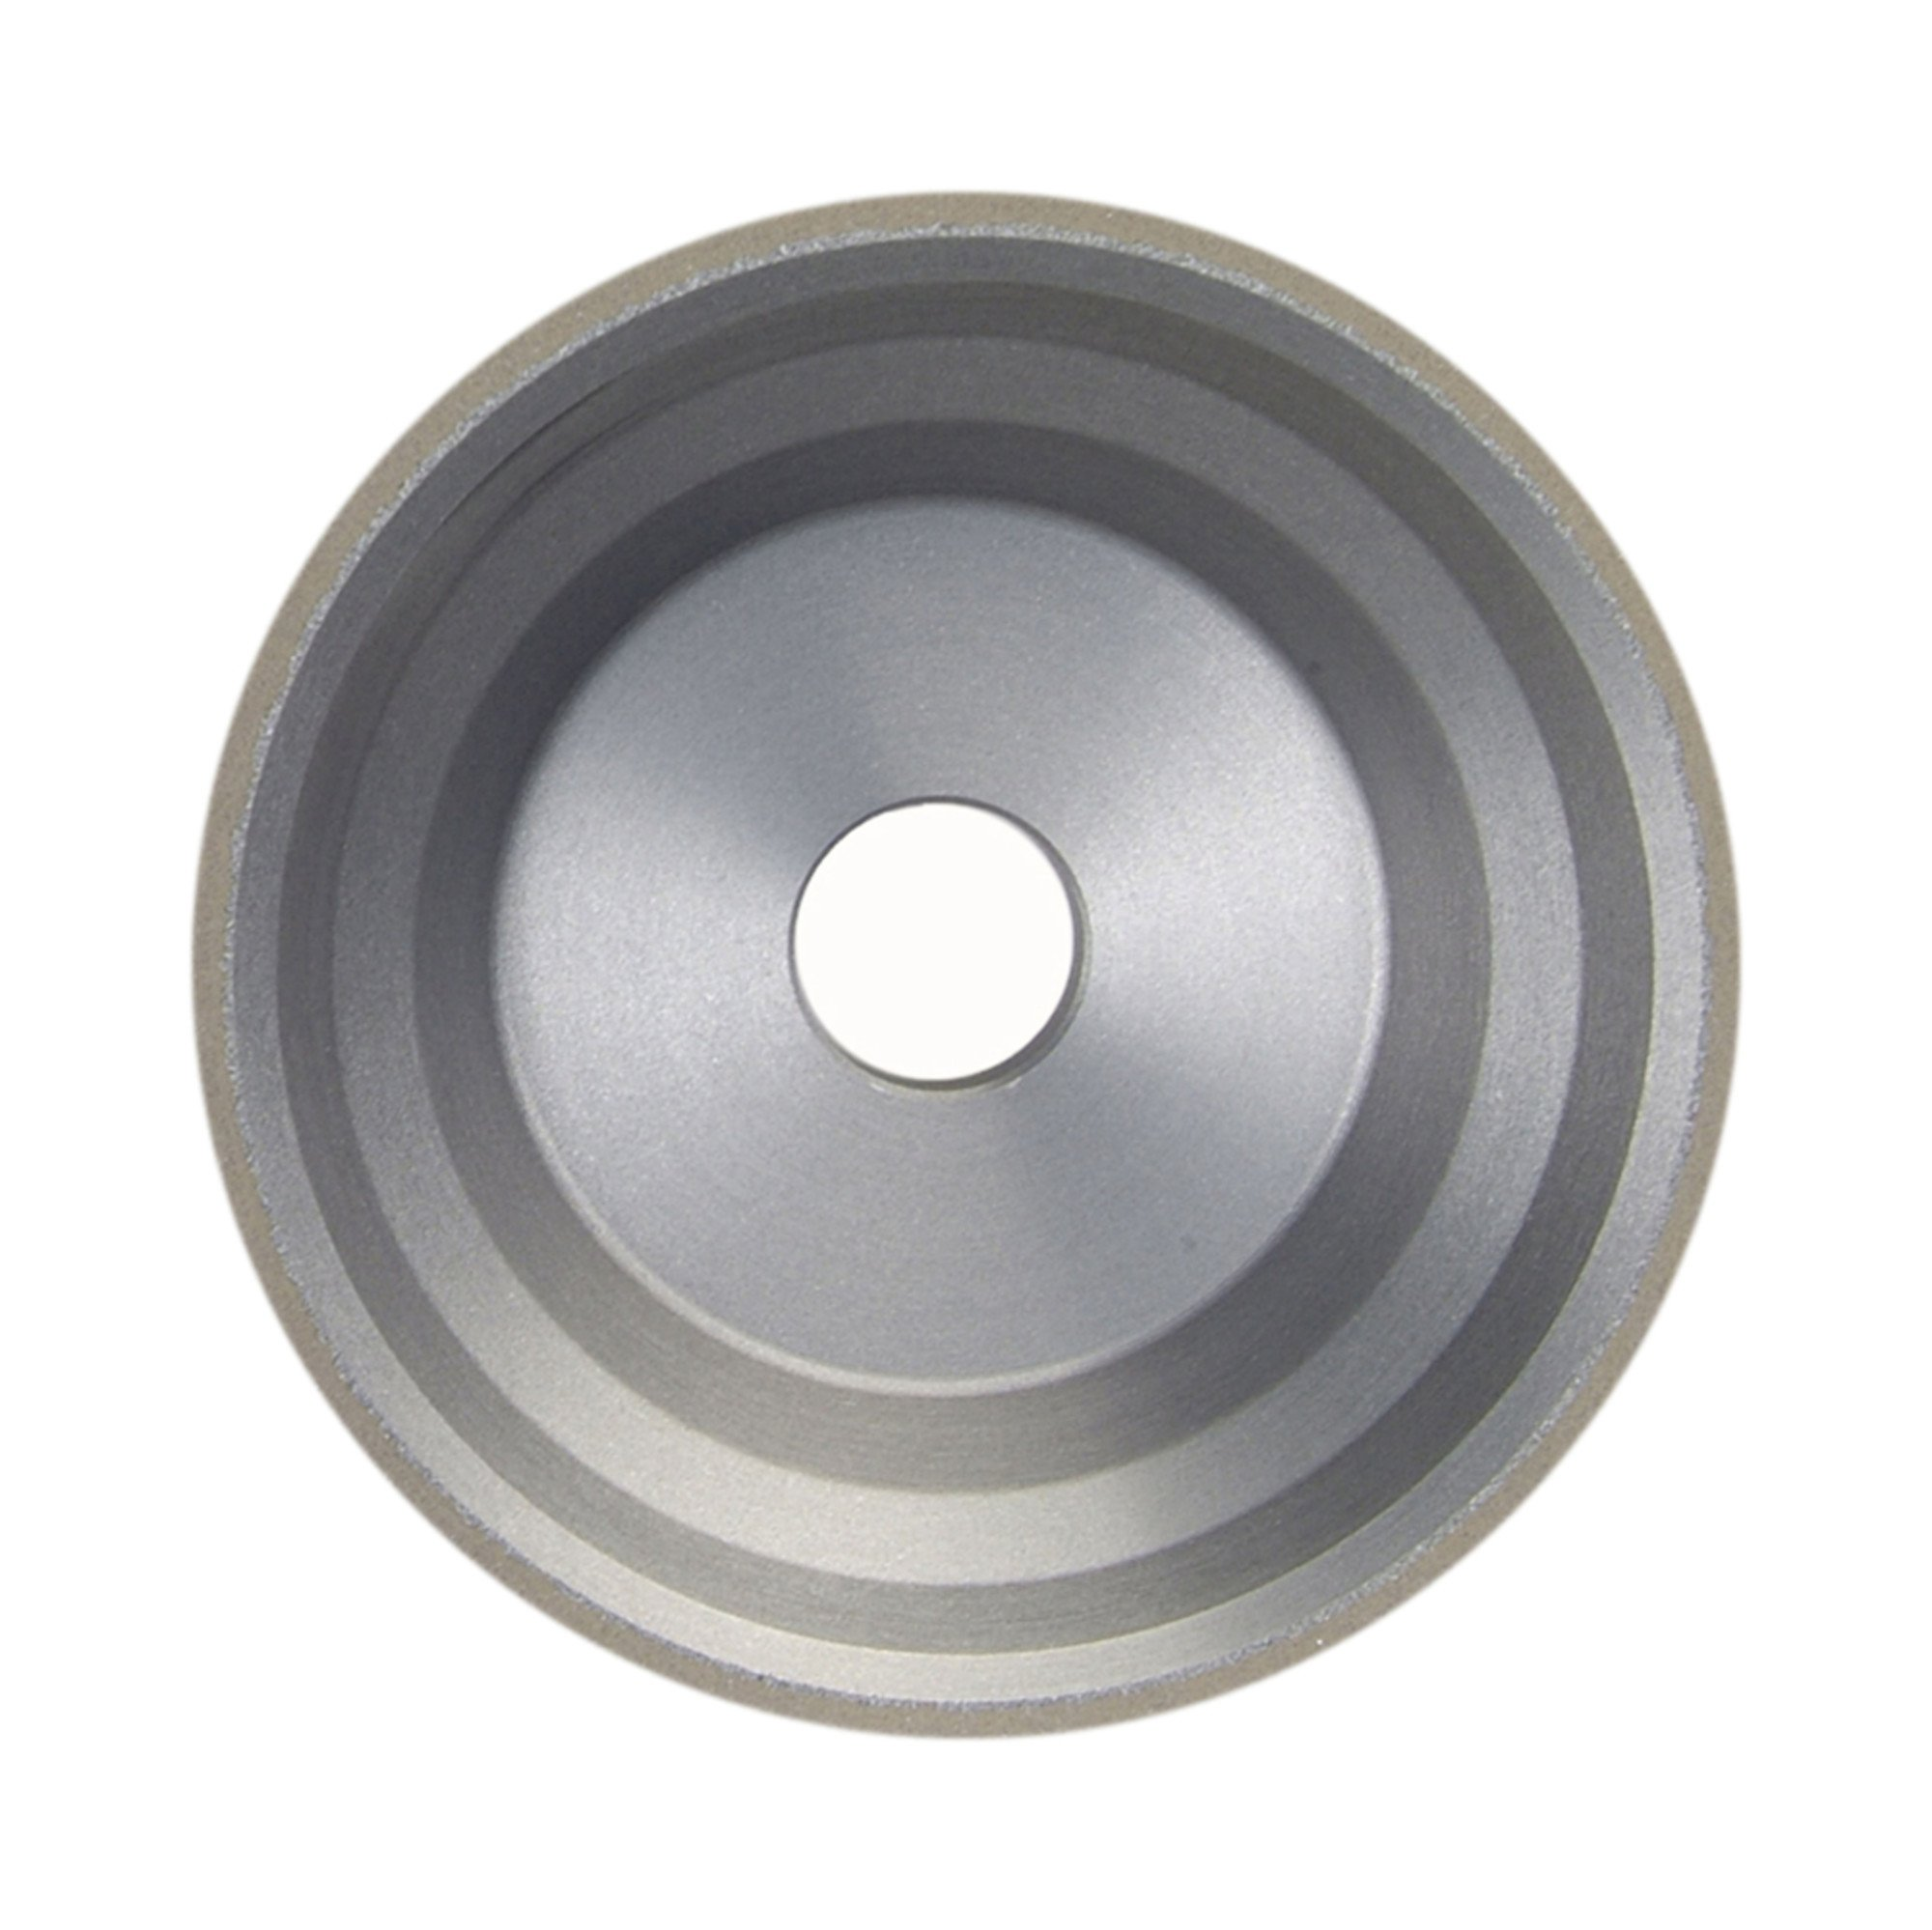 Norton Diamond Wheel 3-3/4'' Diameter 1-1/2'' Width 120 Grit Roughing Application 11V9 Diamond Wheel